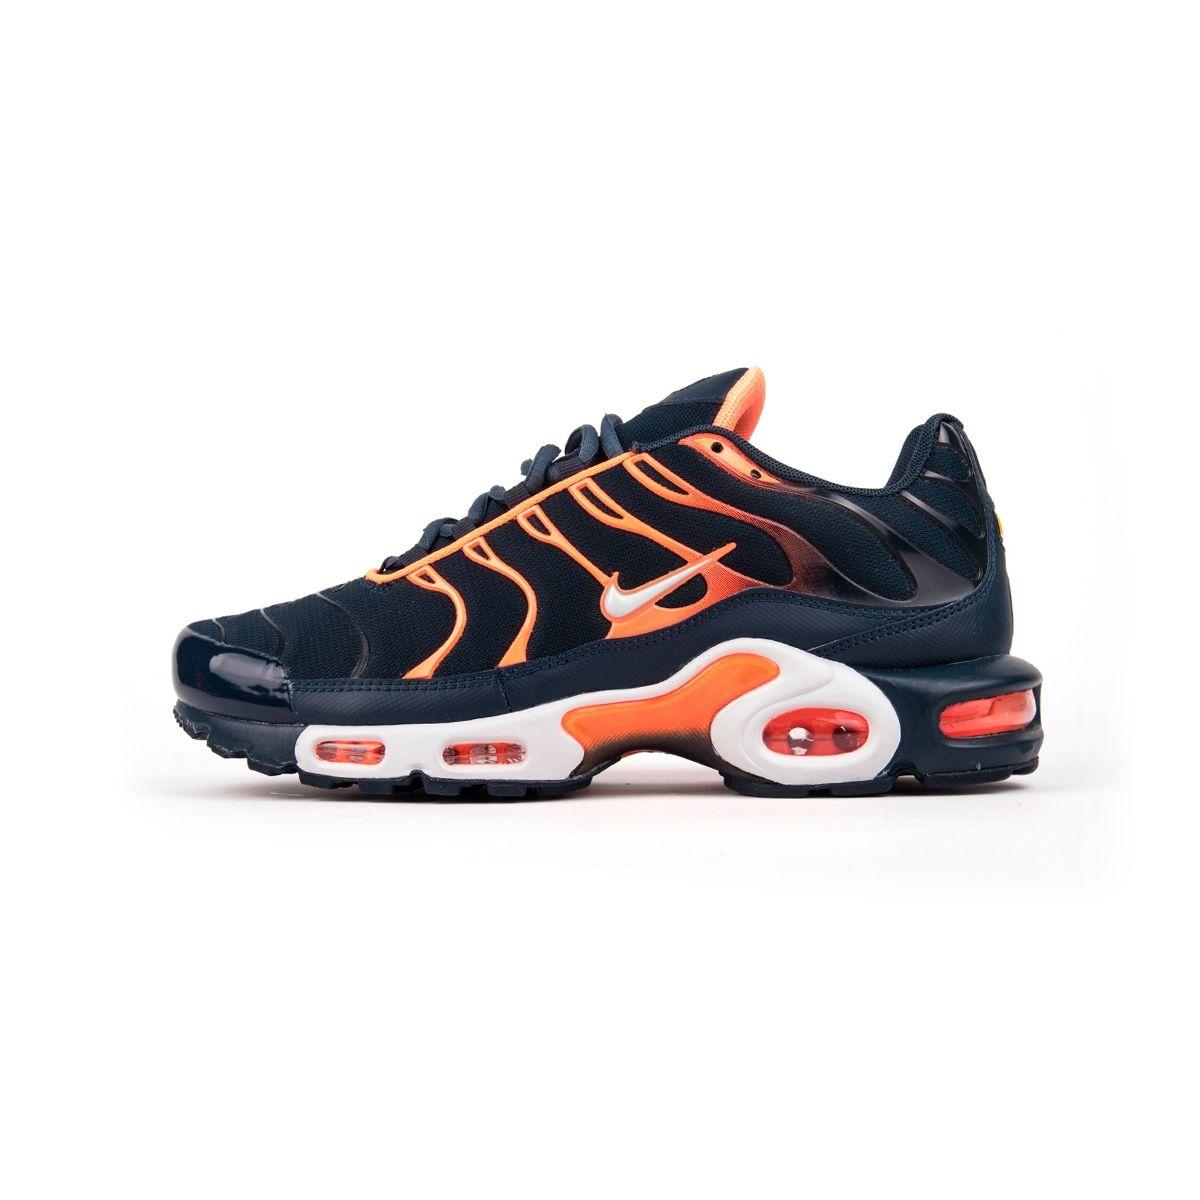 Herren Air Max Plus Chaussures De Sport Nike 852630 Rb3rjX9rEe